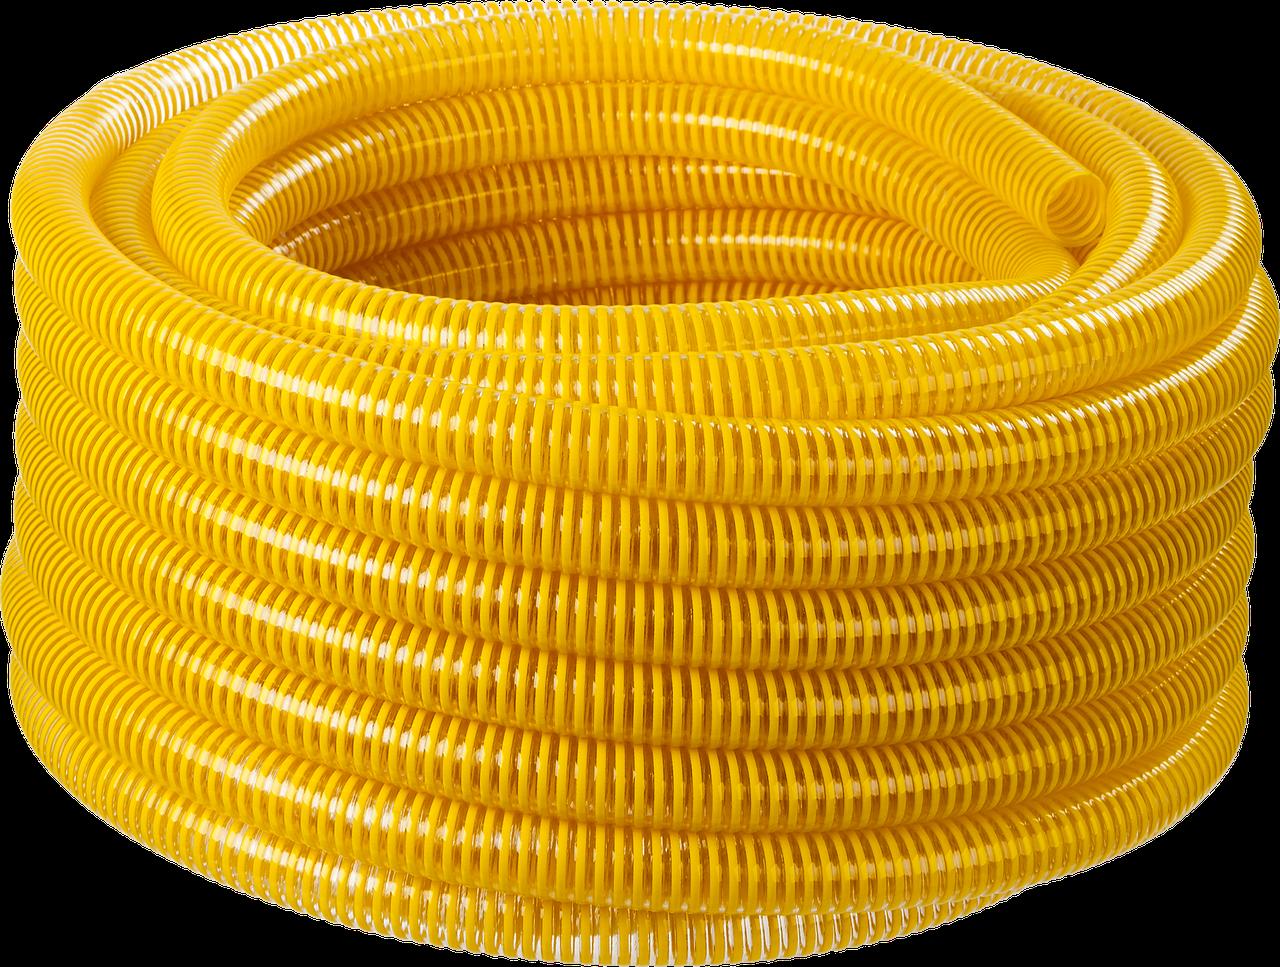 ЗУБР Шланг напорно-всасывающий со спиралью ПВХ, 10 атм, 19мм х 15м 480, 38, 15